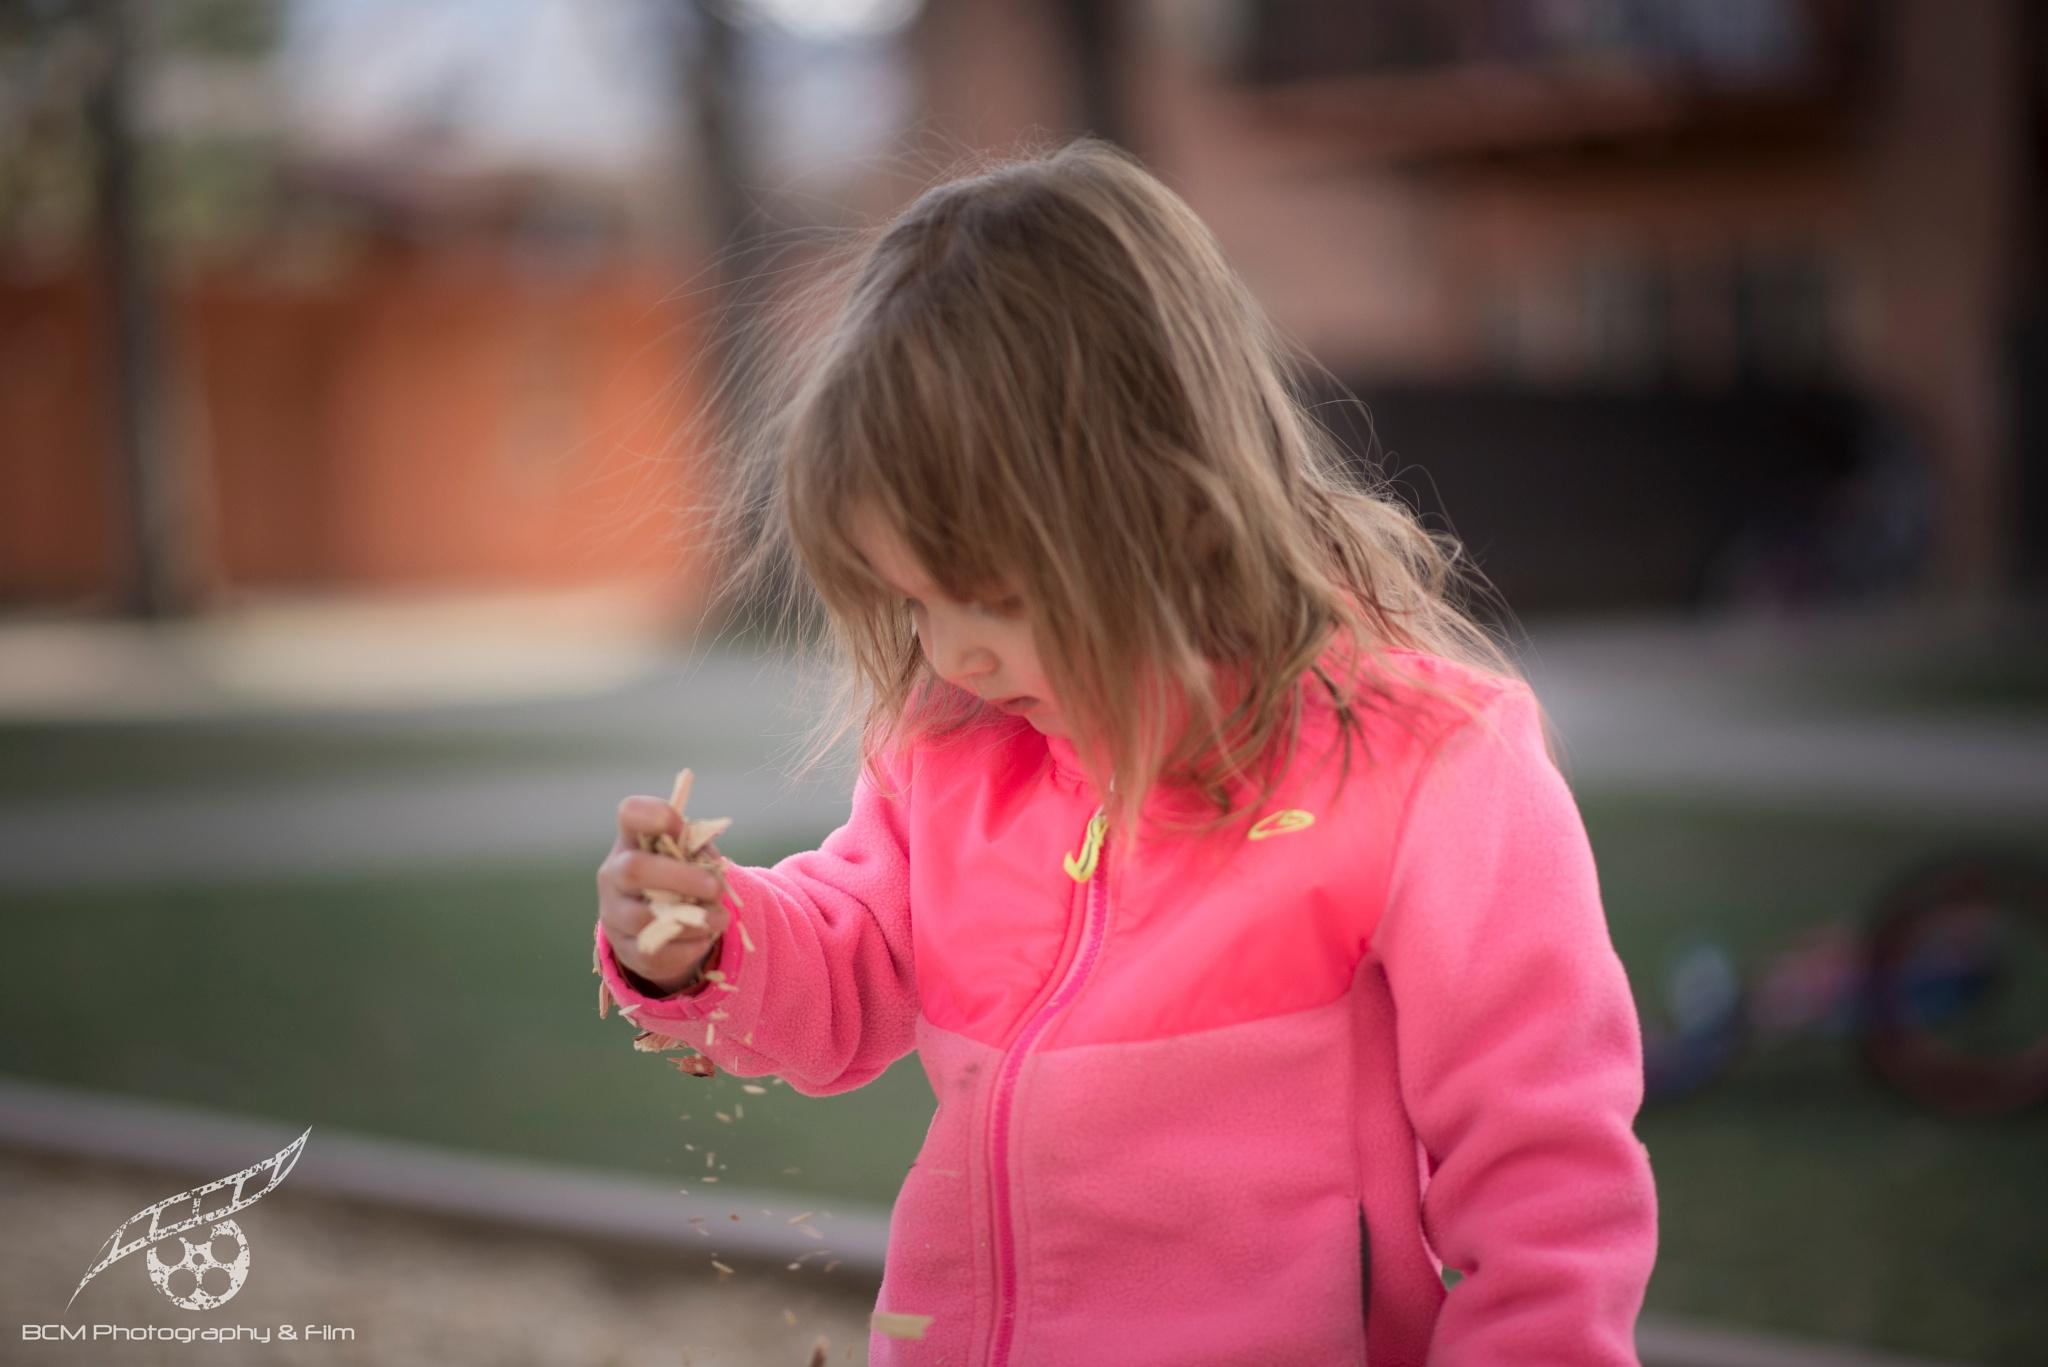 At The Playground by Barbara Cardinali MacFerrin